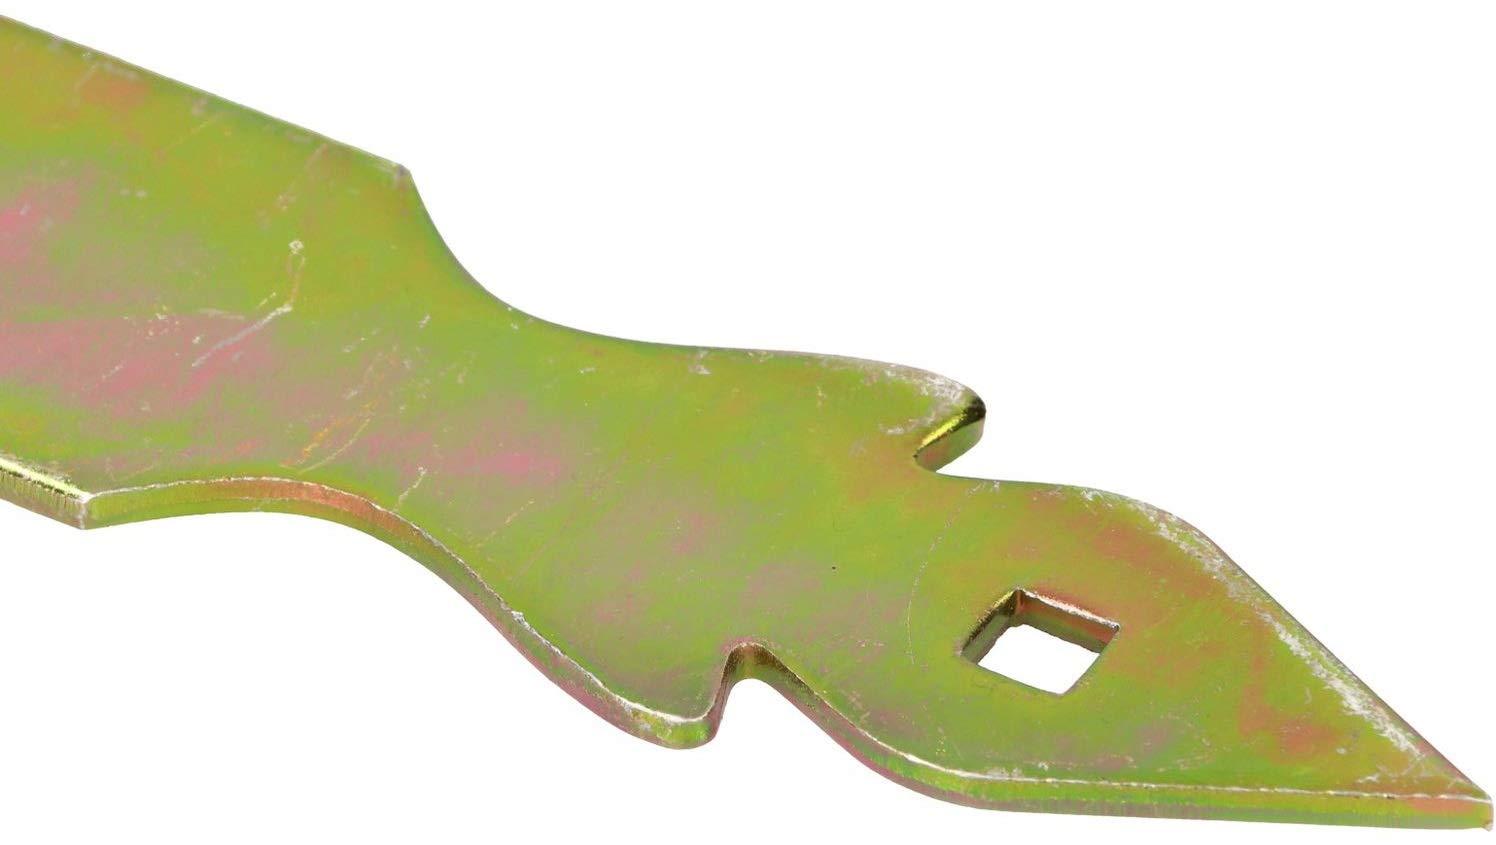 KOTARBAU Kreuzgeh/änge 500 mm Ladenband Scharnier Band Platte Baubeschlag Torbeschlag Holzverbindung Werfgeh/änge T-Band T-Scharnier Verzinkt Dekorativ